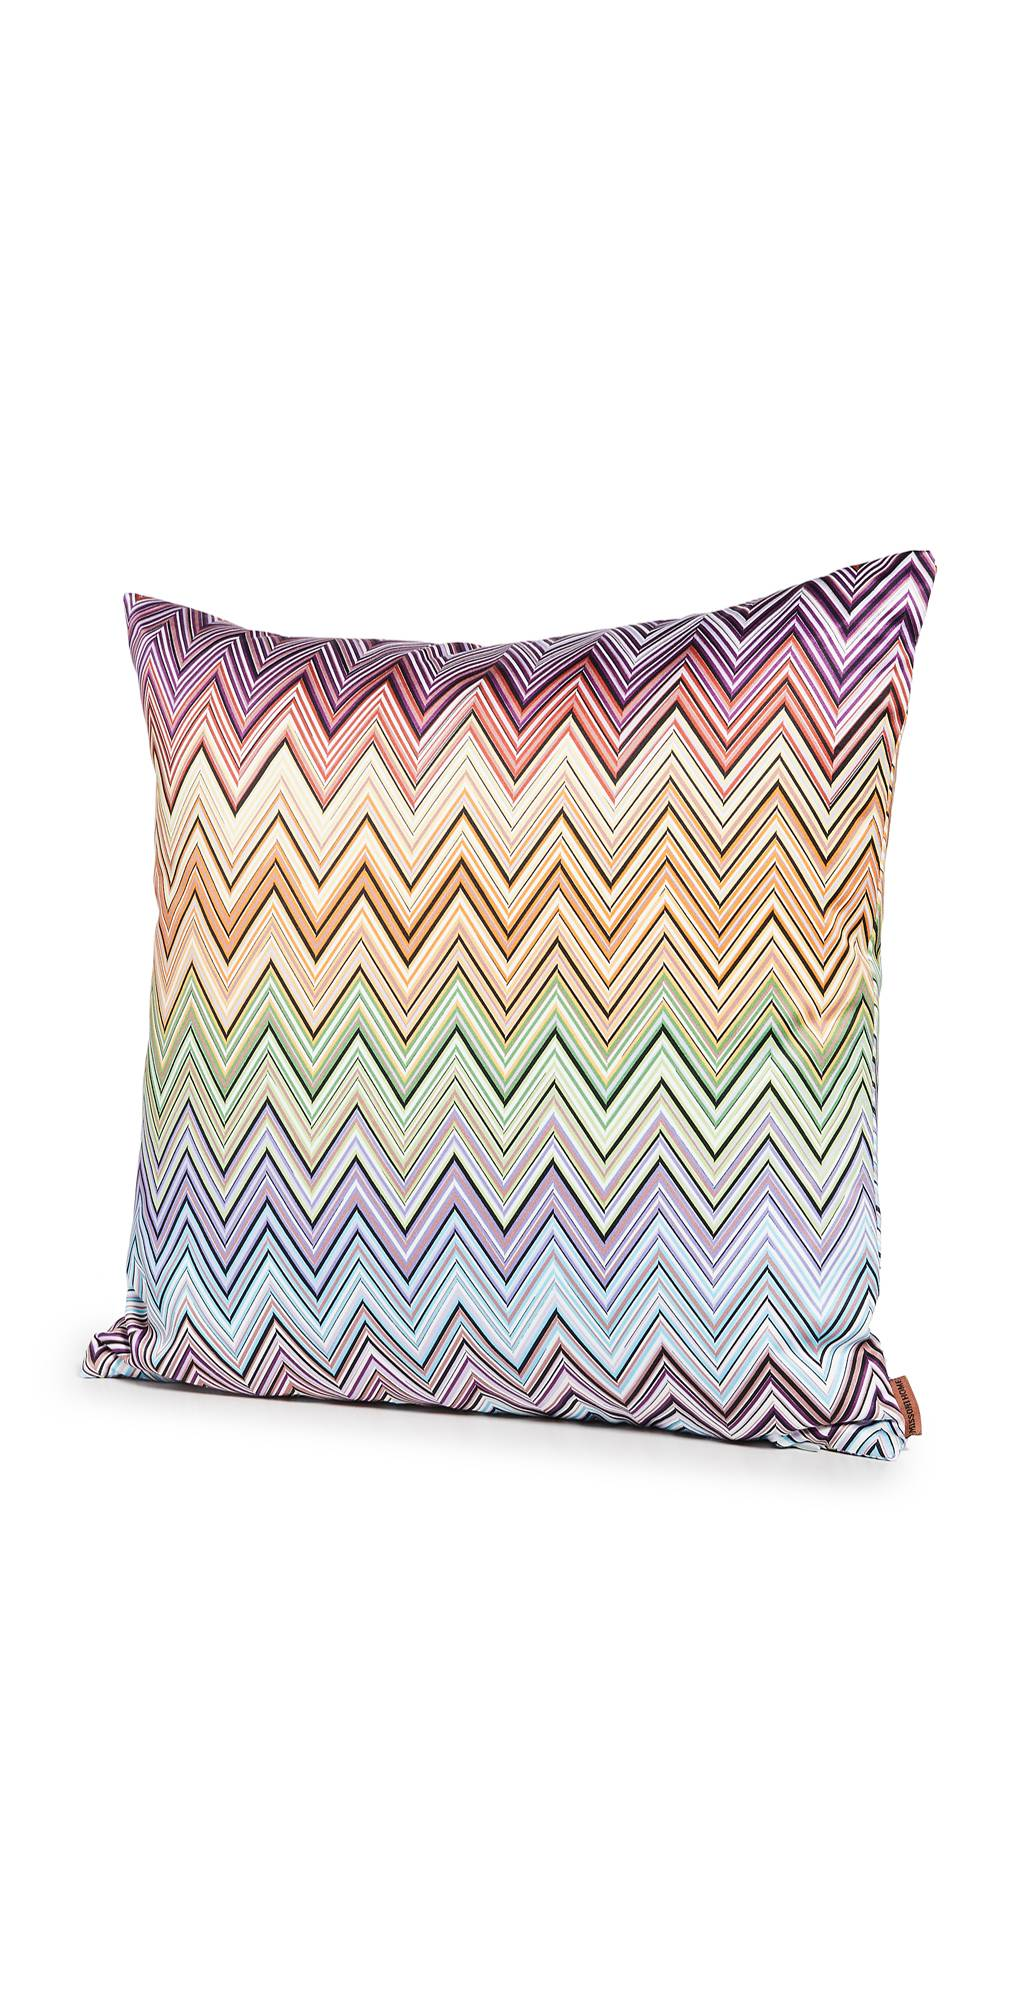 Missoni Home Jarris Cushion  - Multi - Size: One Size